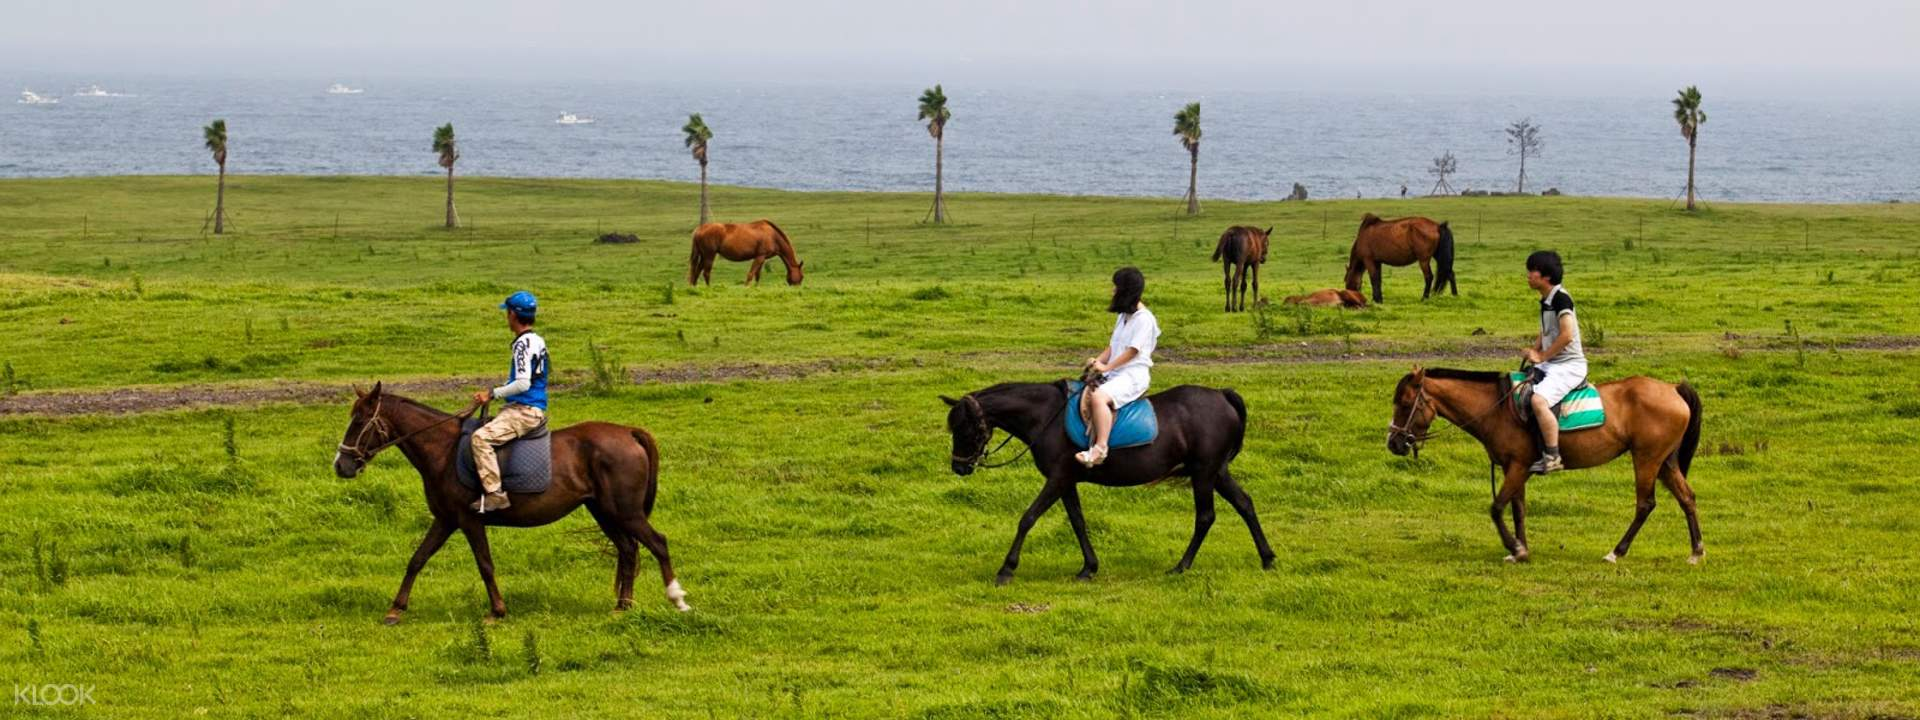 Jeju Land Horseback Riding - Klook